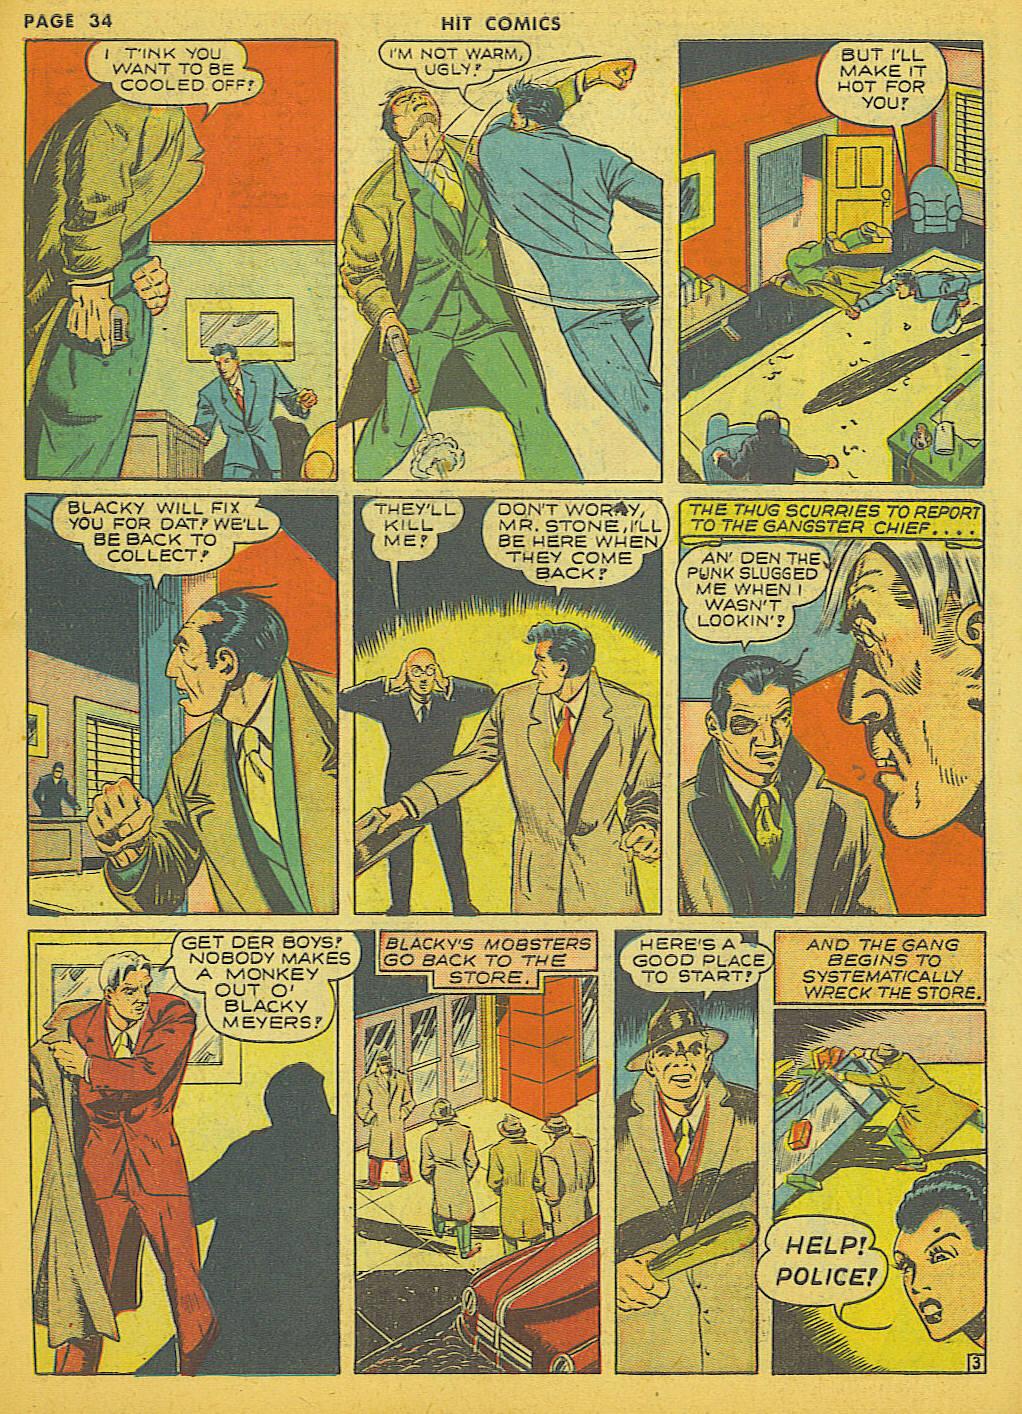 Read online Hit Comics comic -  Issue #21 - 36